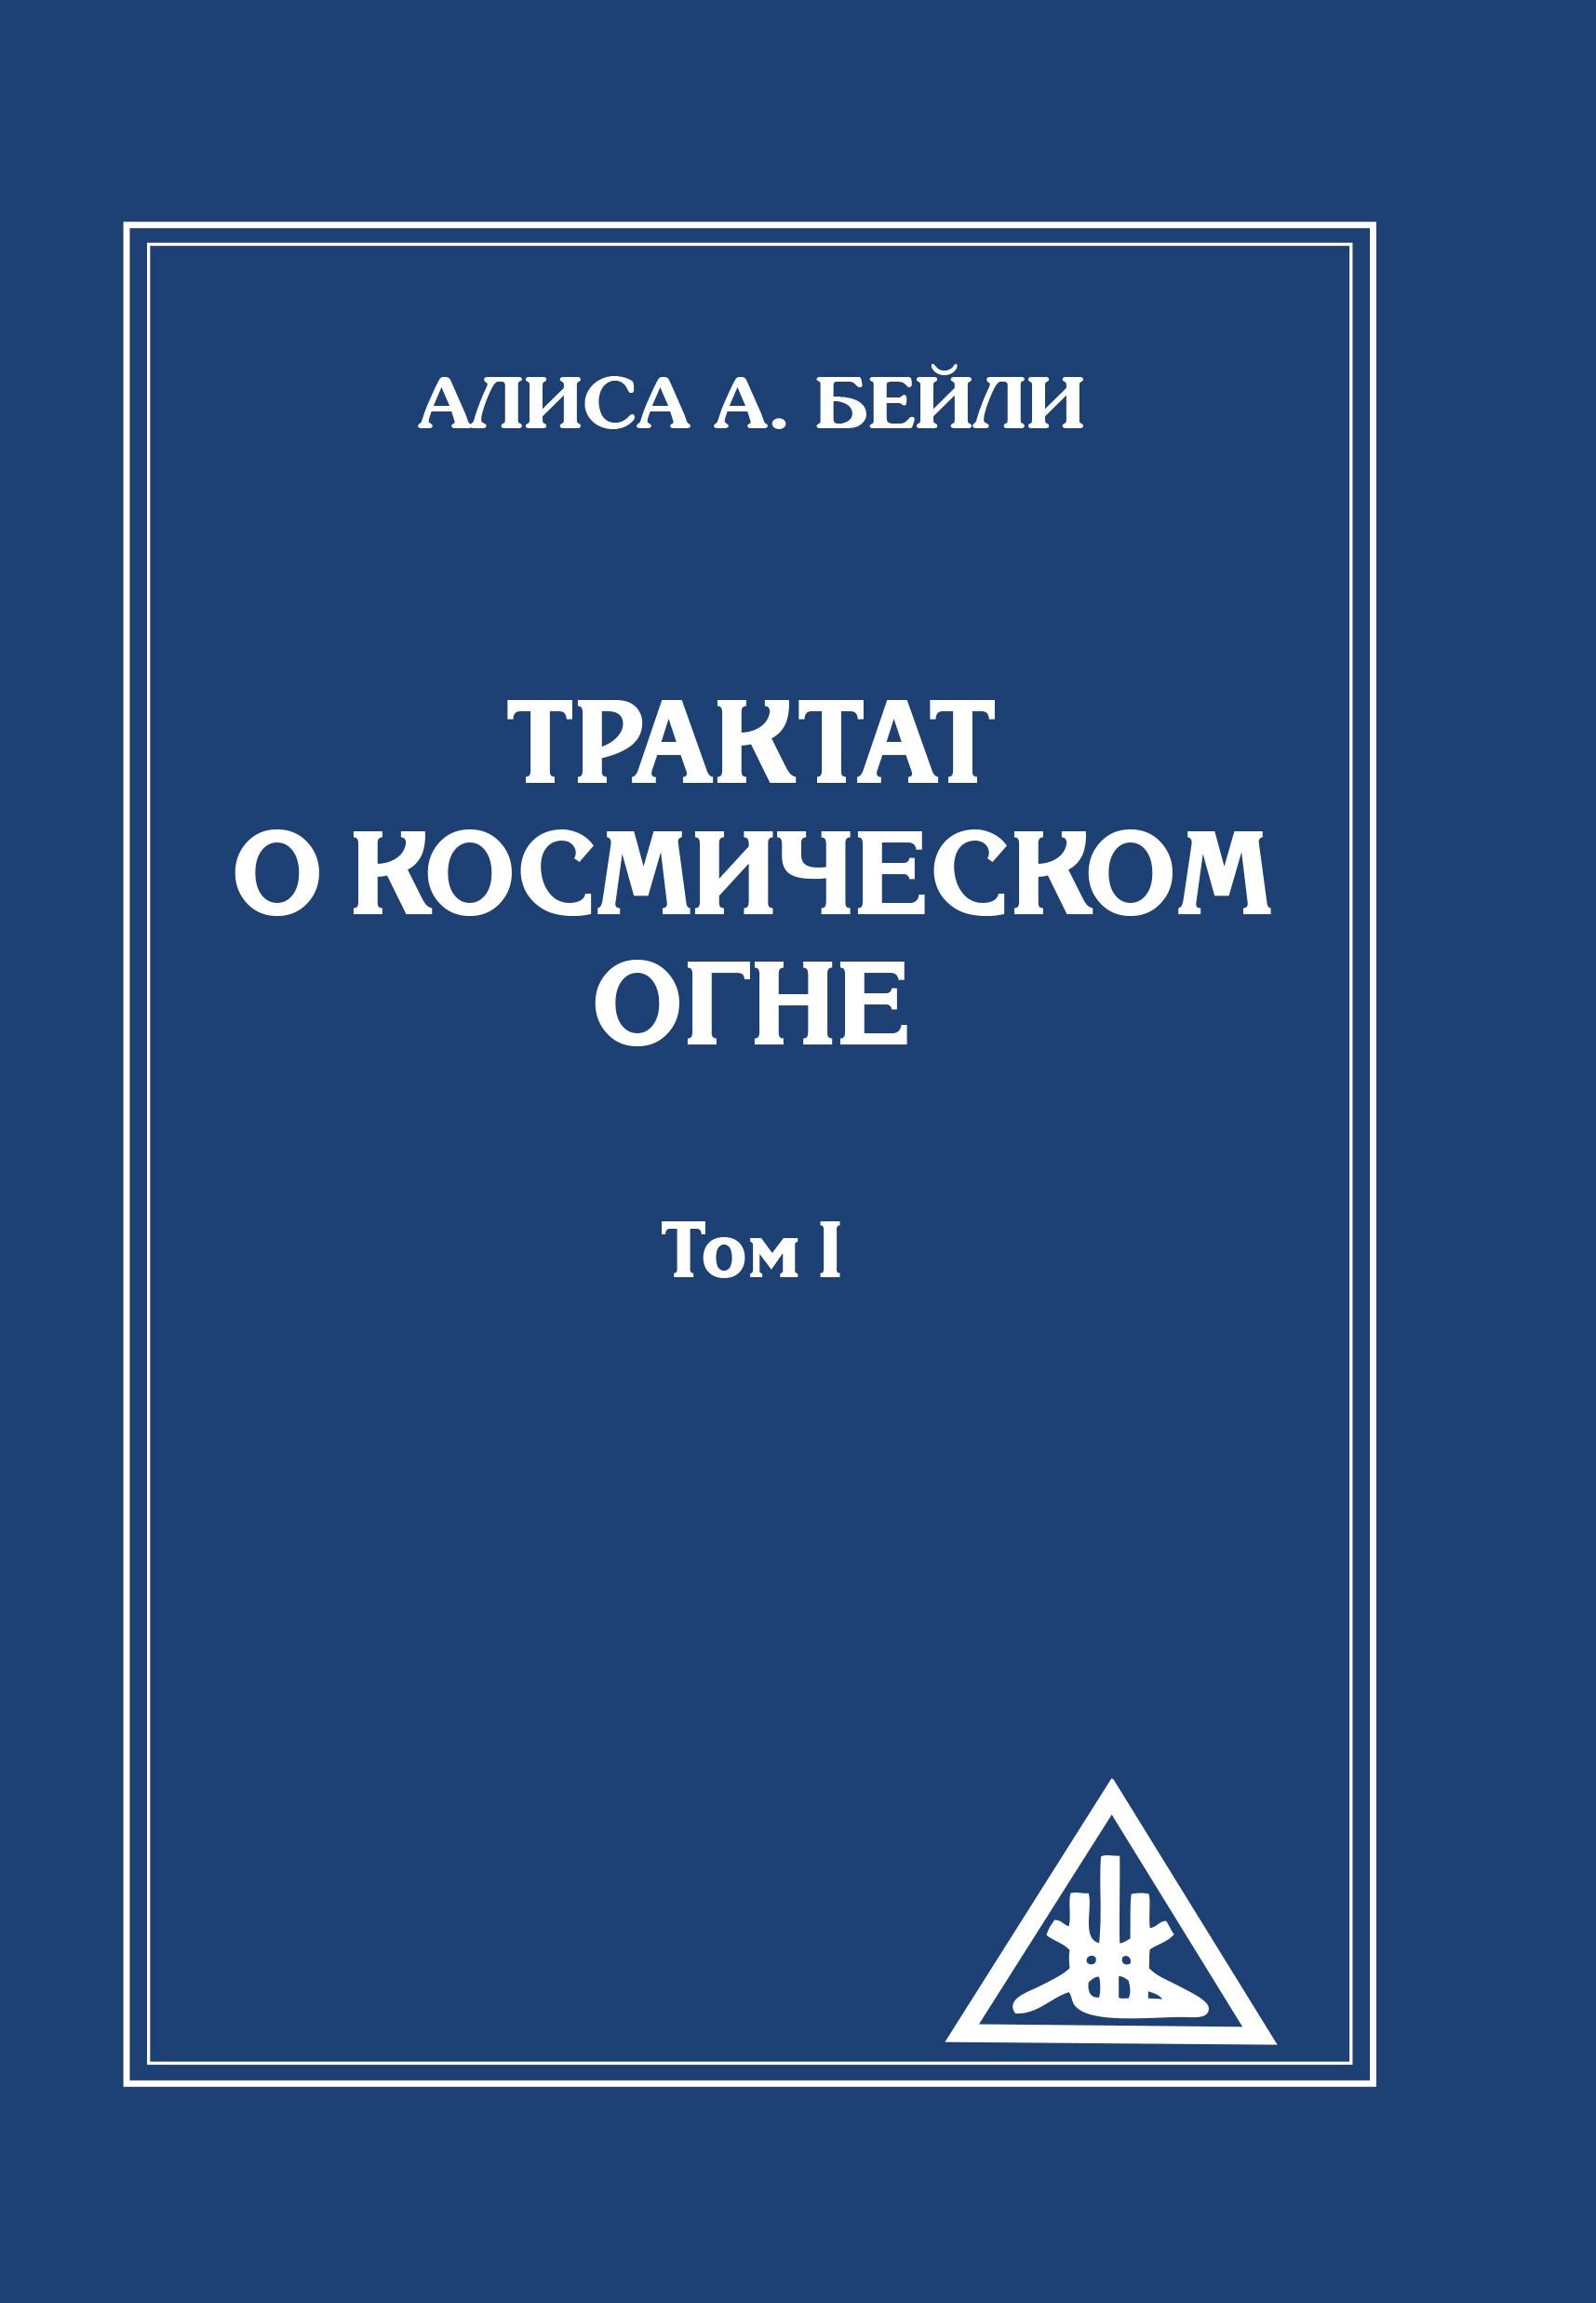 Трактат о Космическом Огне. Том 1. Алиса А. Бейли